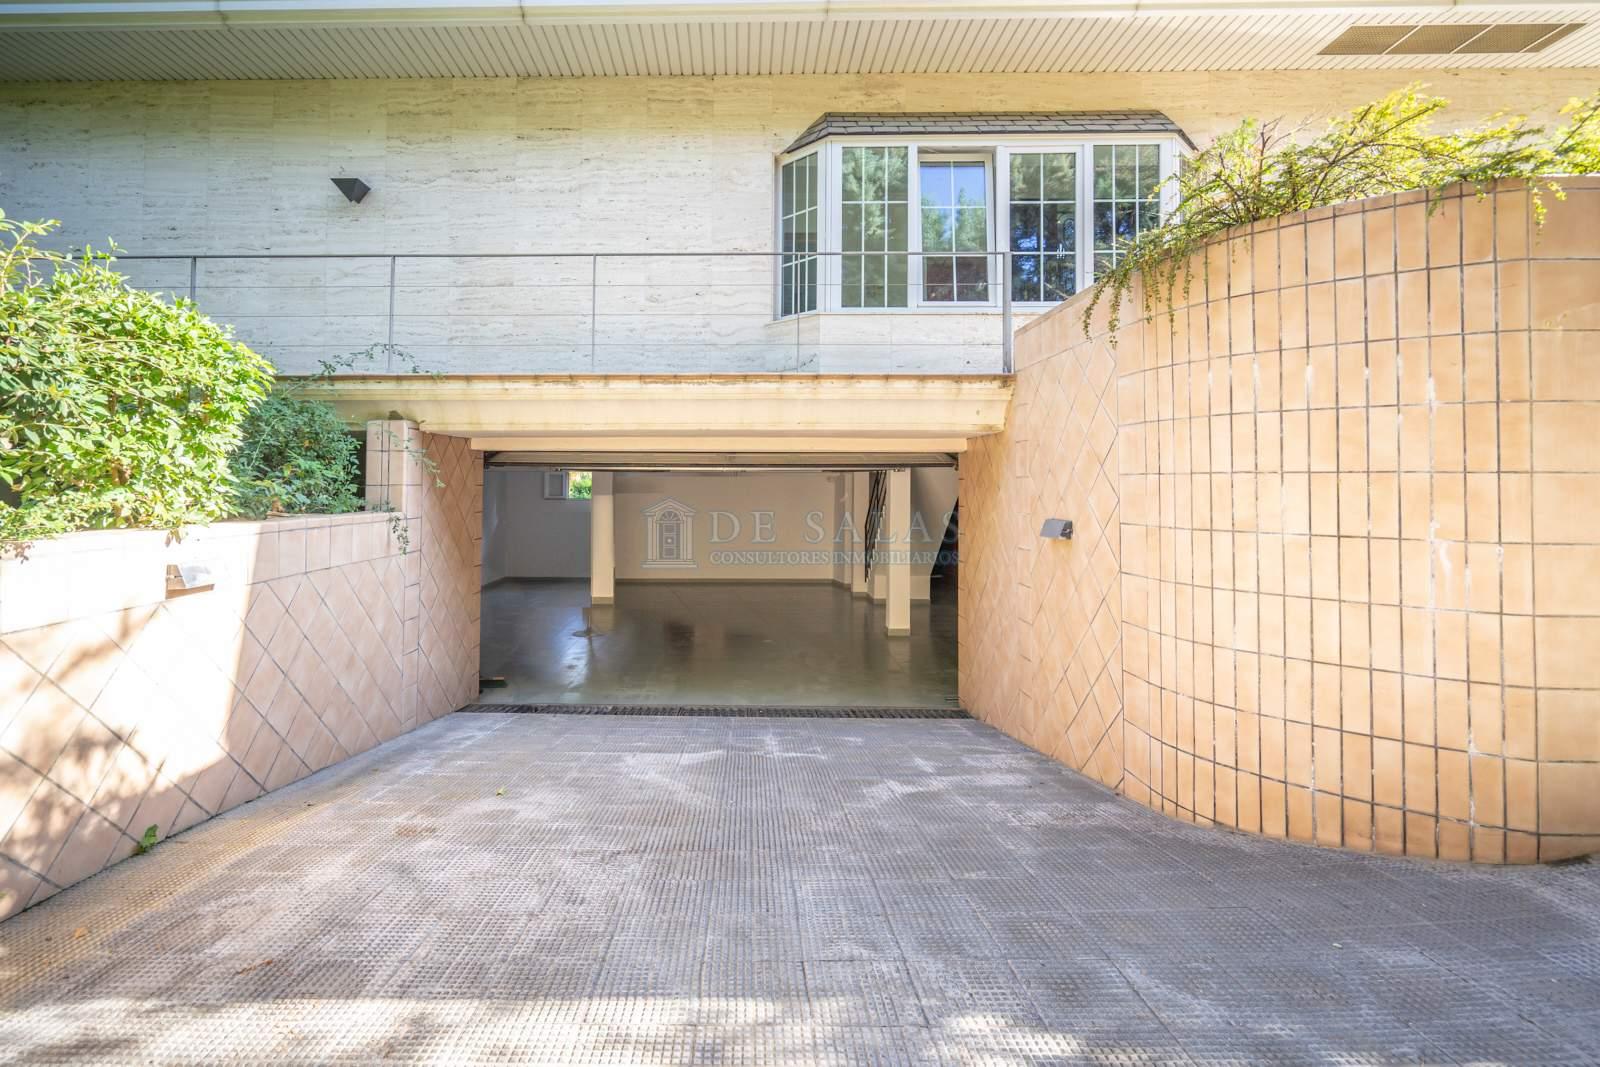 Garaje-14 Maison La Moraleja